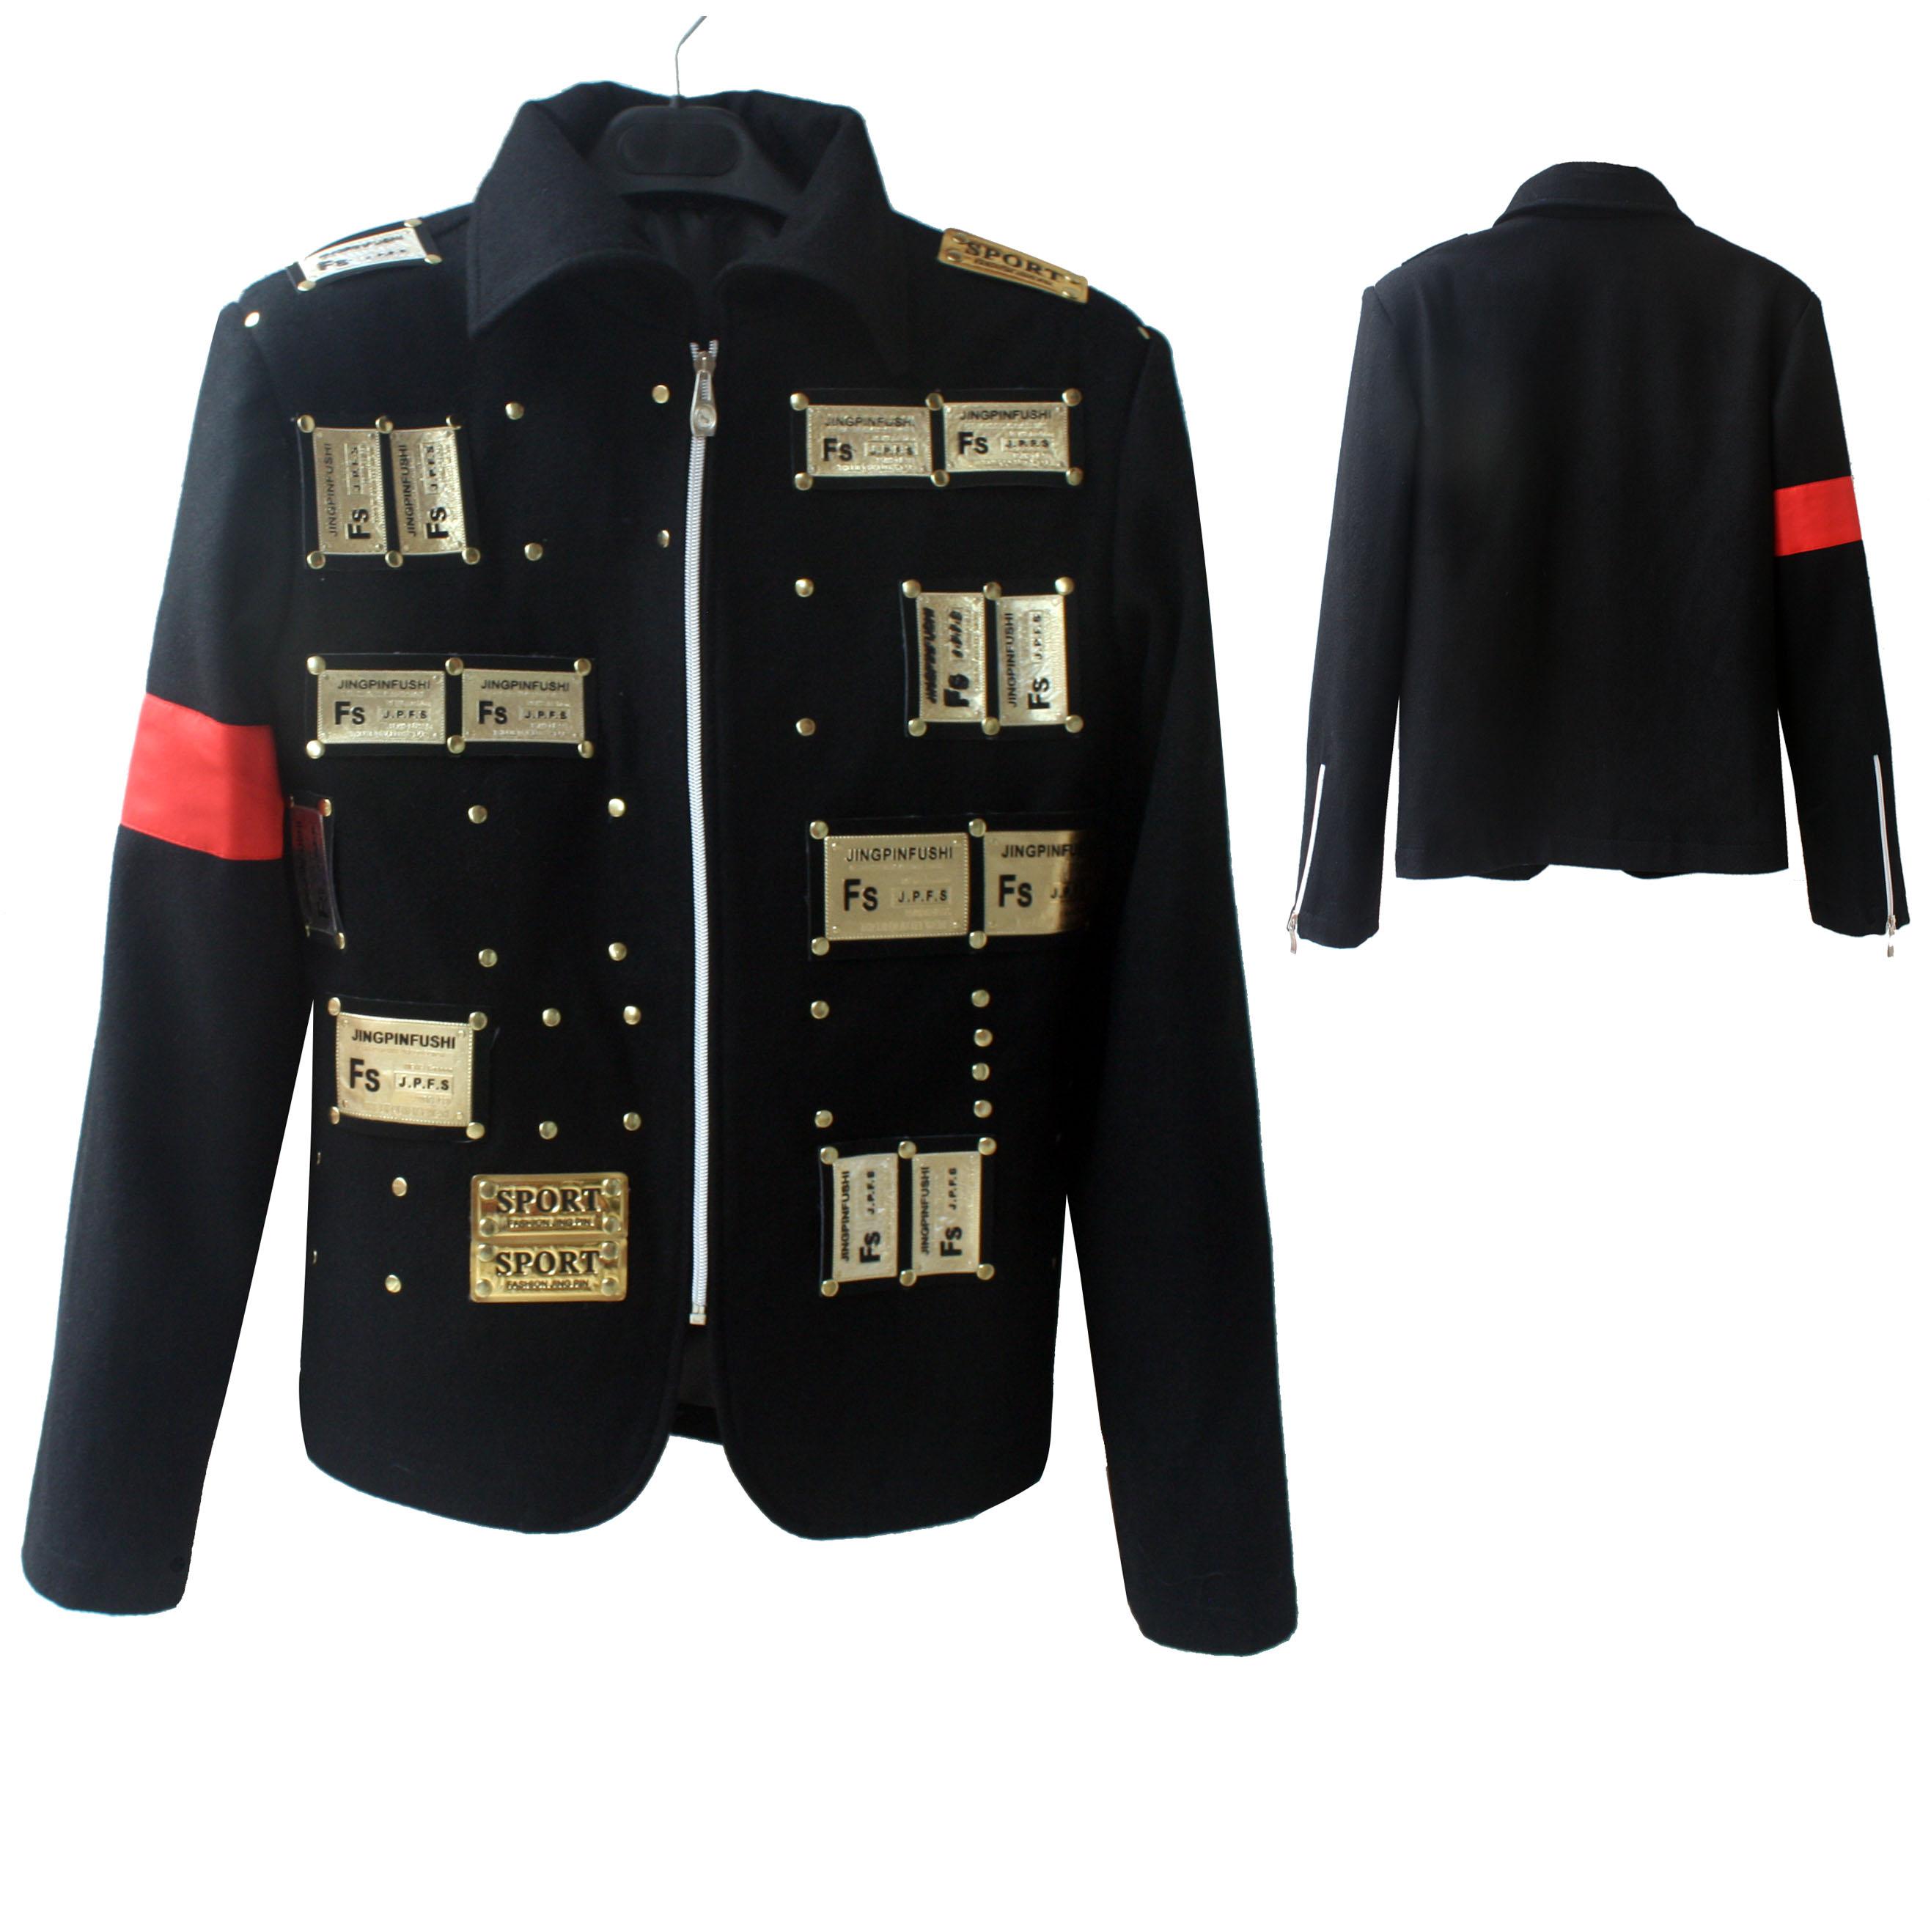 Rare MJ Michael Jackson Black Charity Pepsi Ad Punk Rivet Retro England woolen Jacket Outwear(China (Mainland))